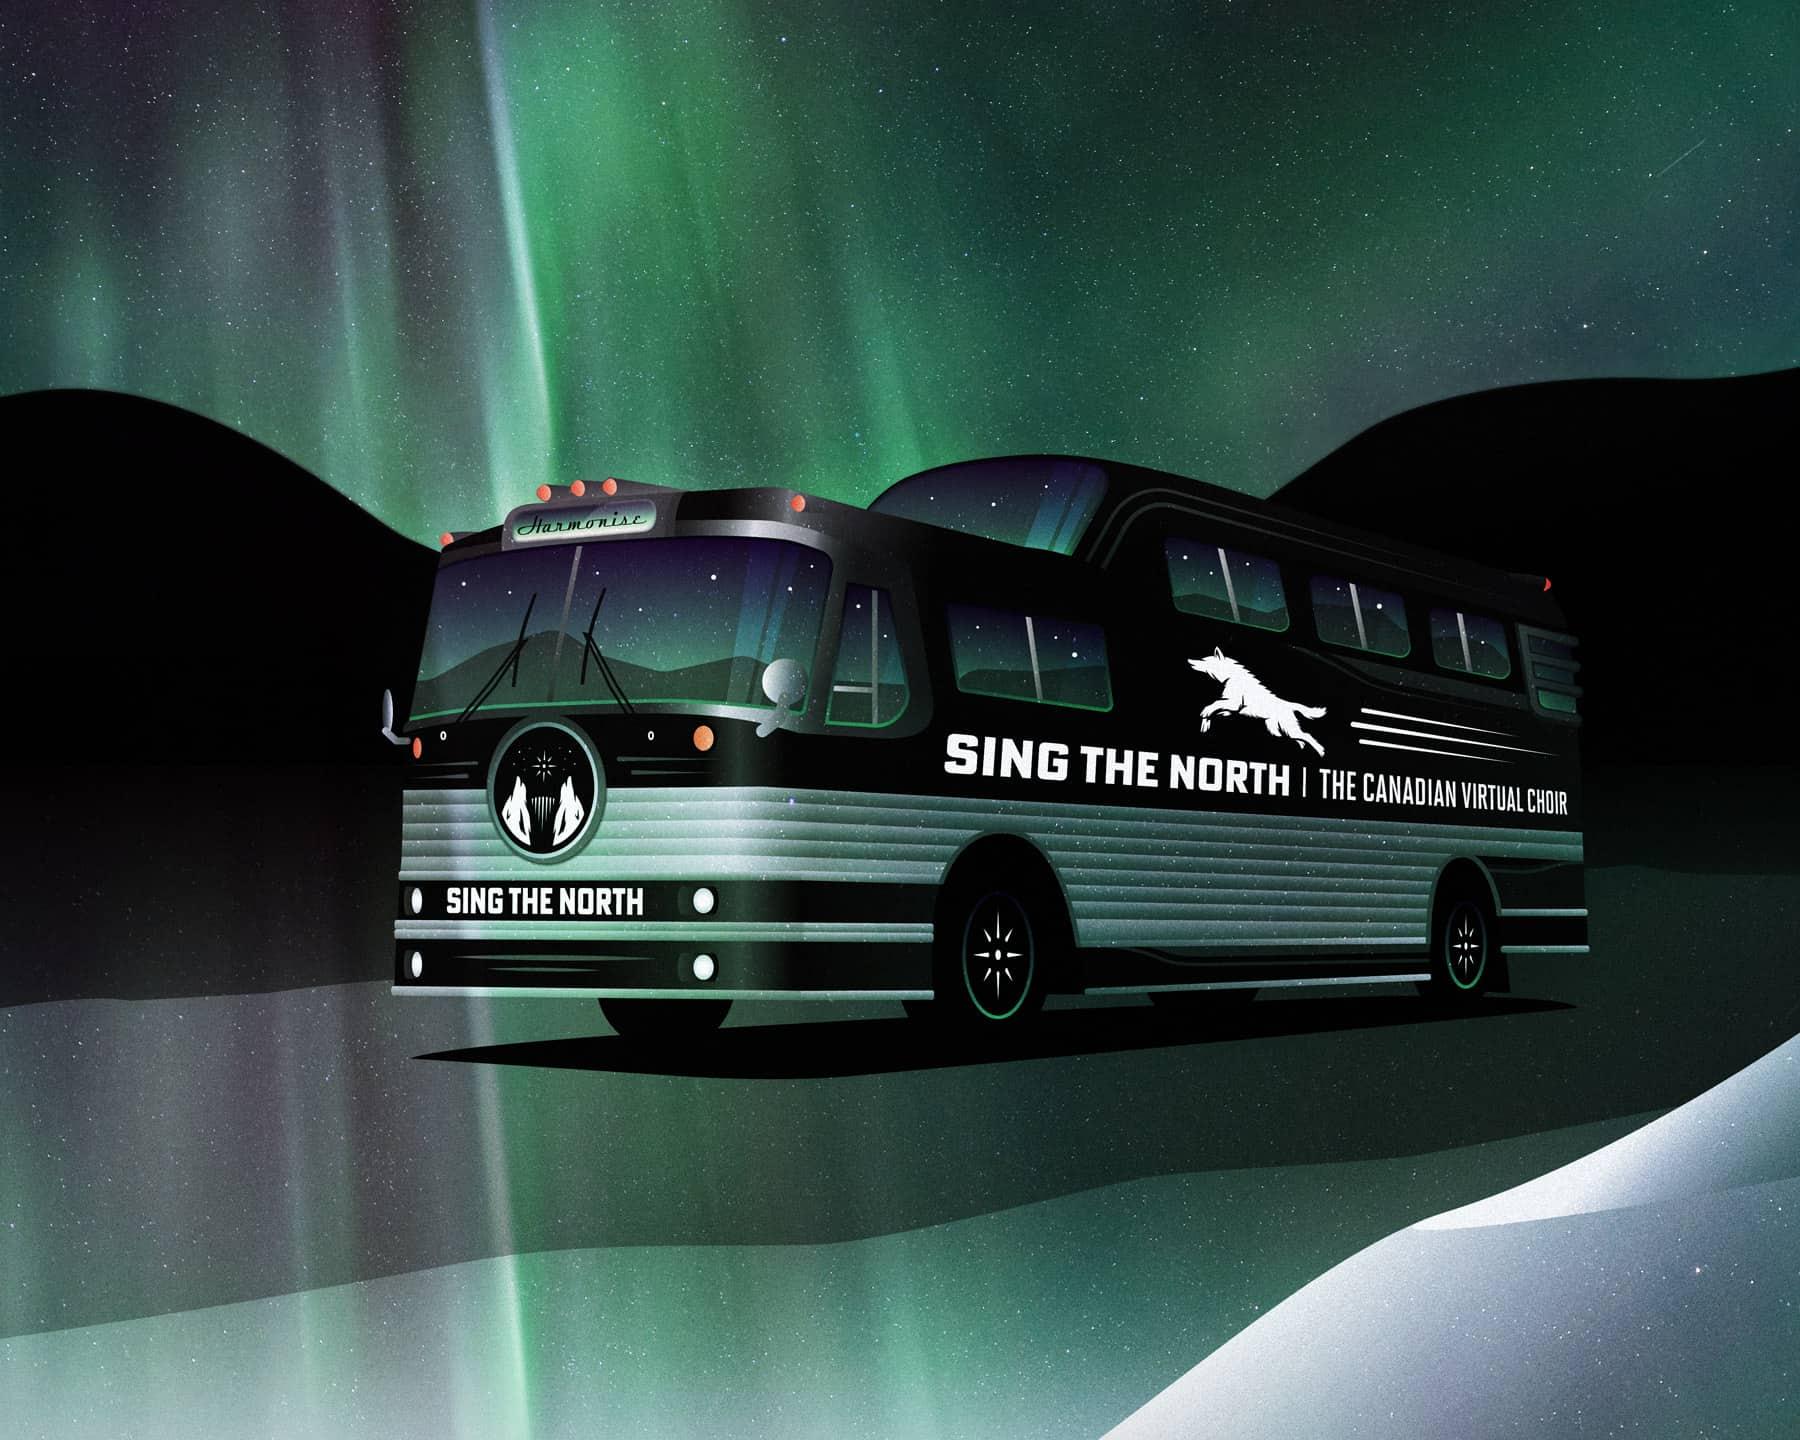 sing-the-north-bus-landscape-arctic-r45